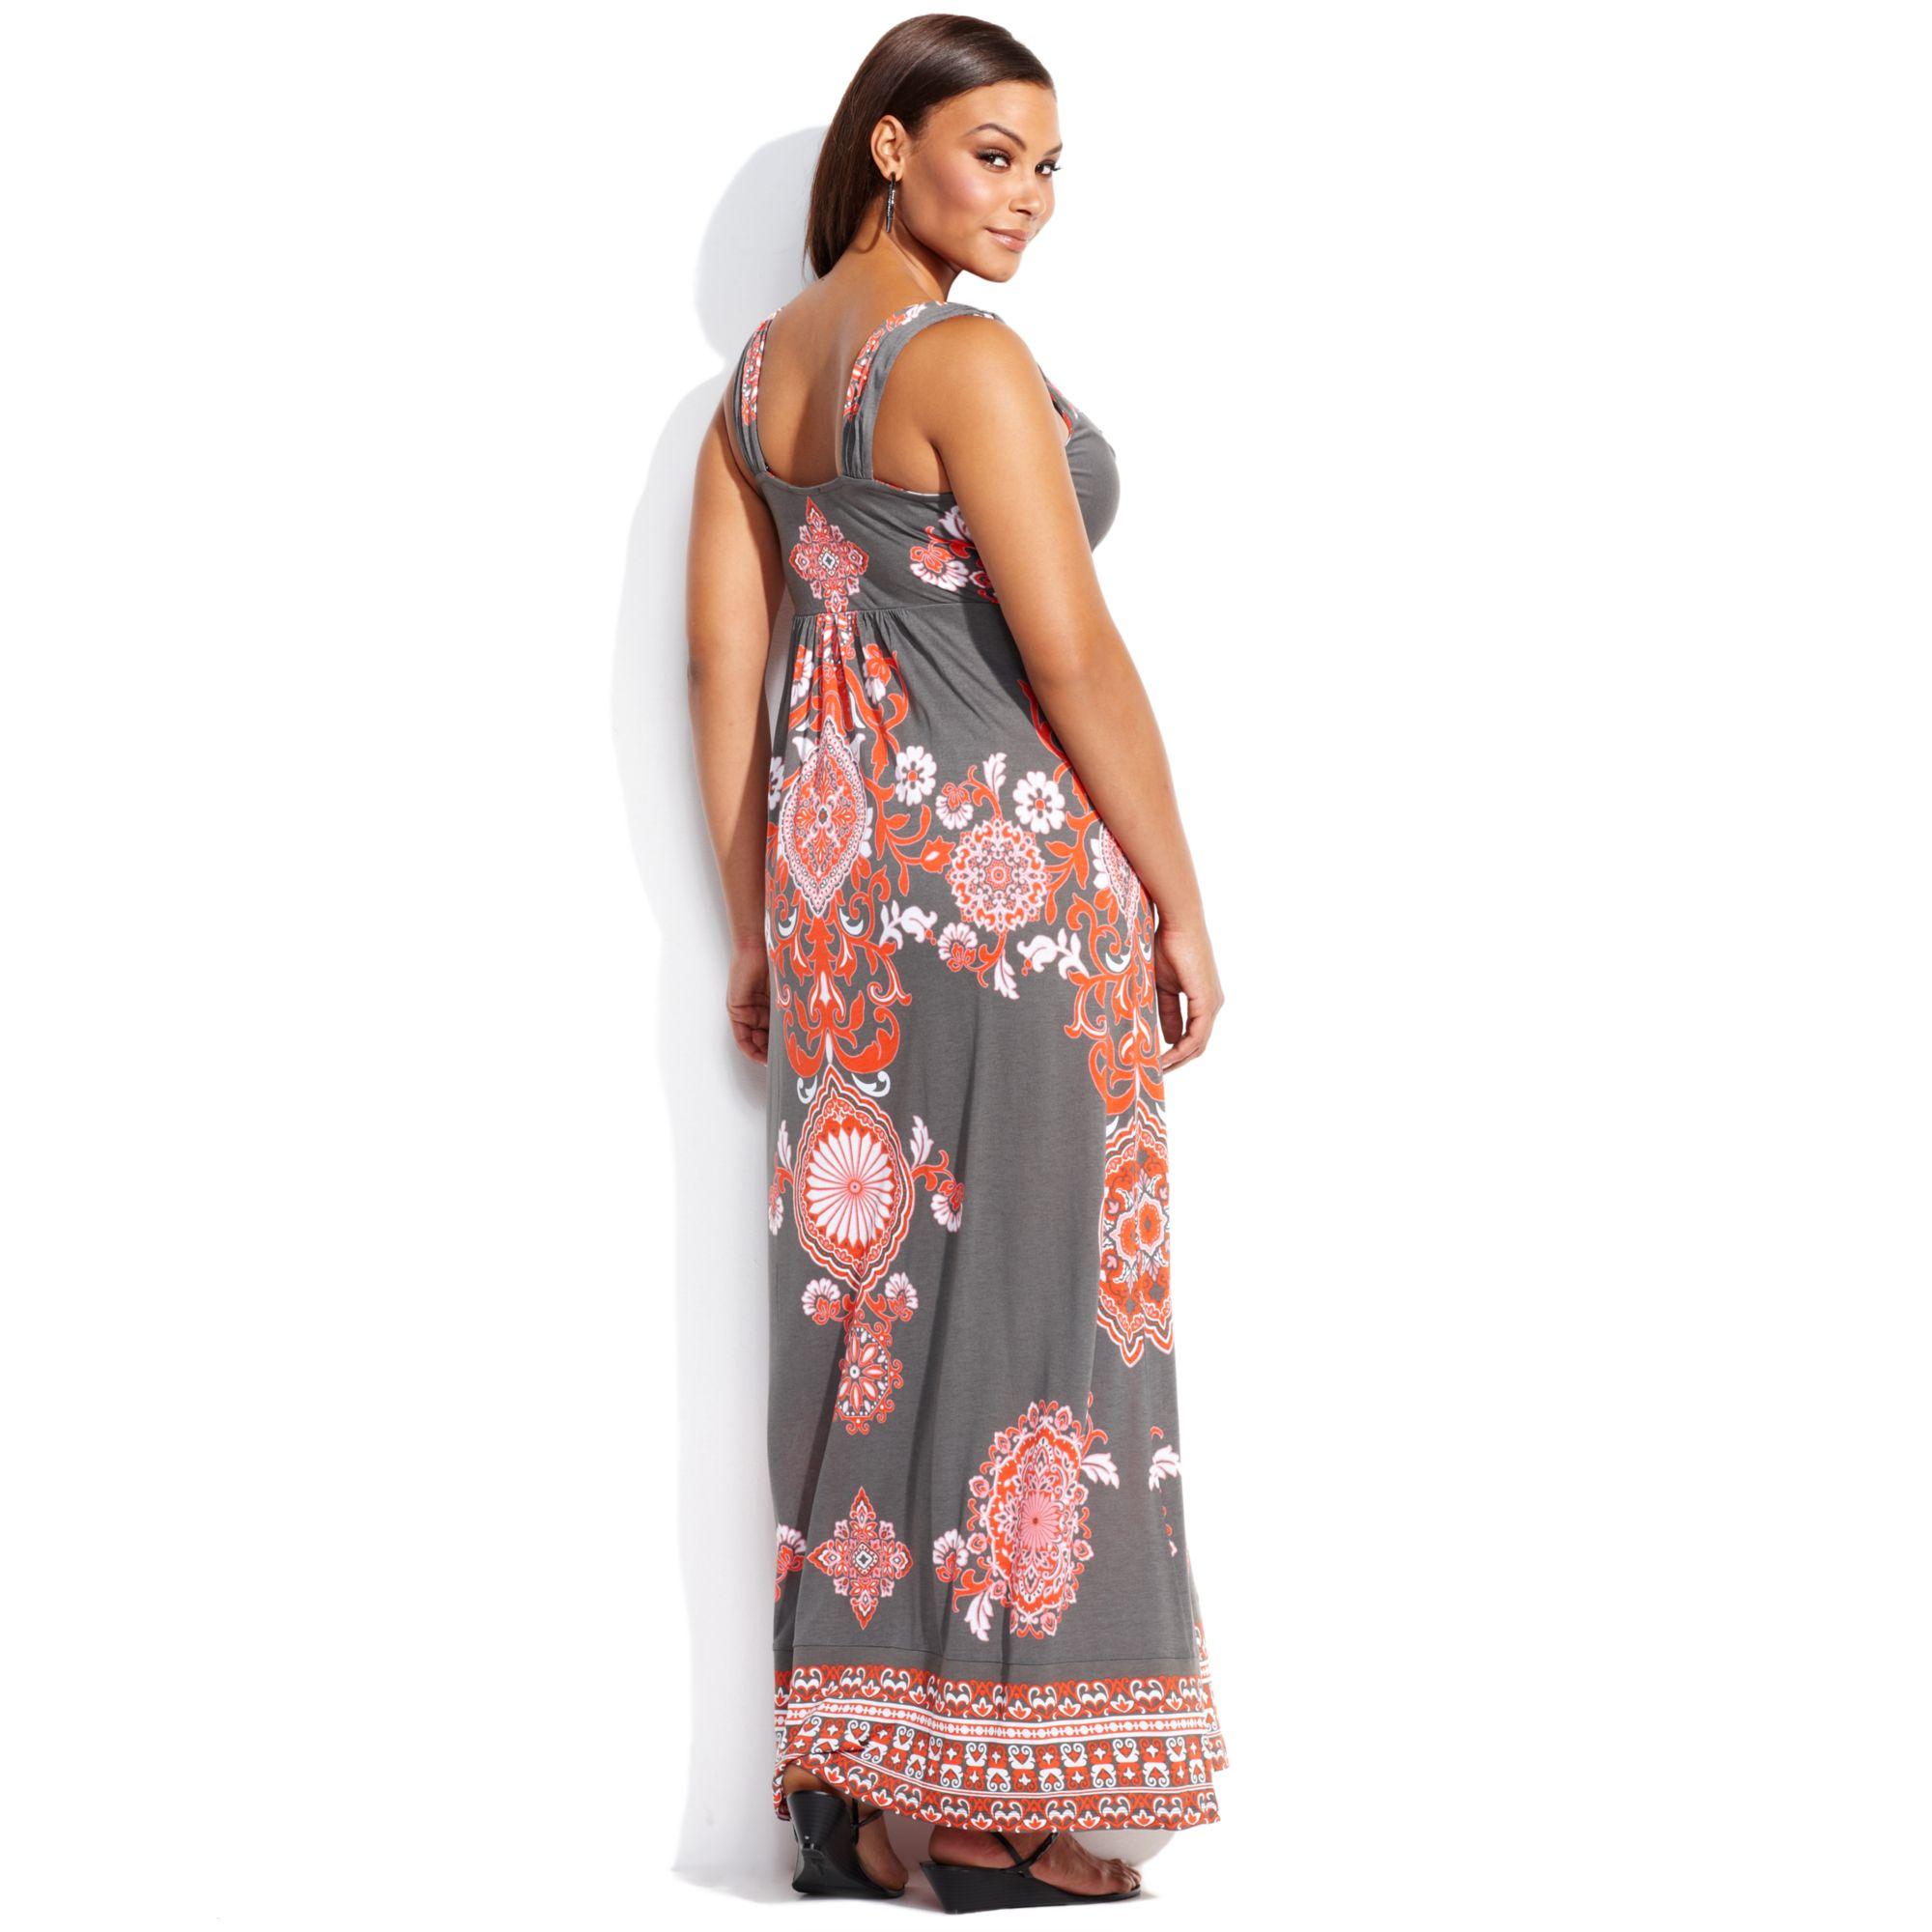 Macys Petite Plus Size Dresses - Down To Earth Bali